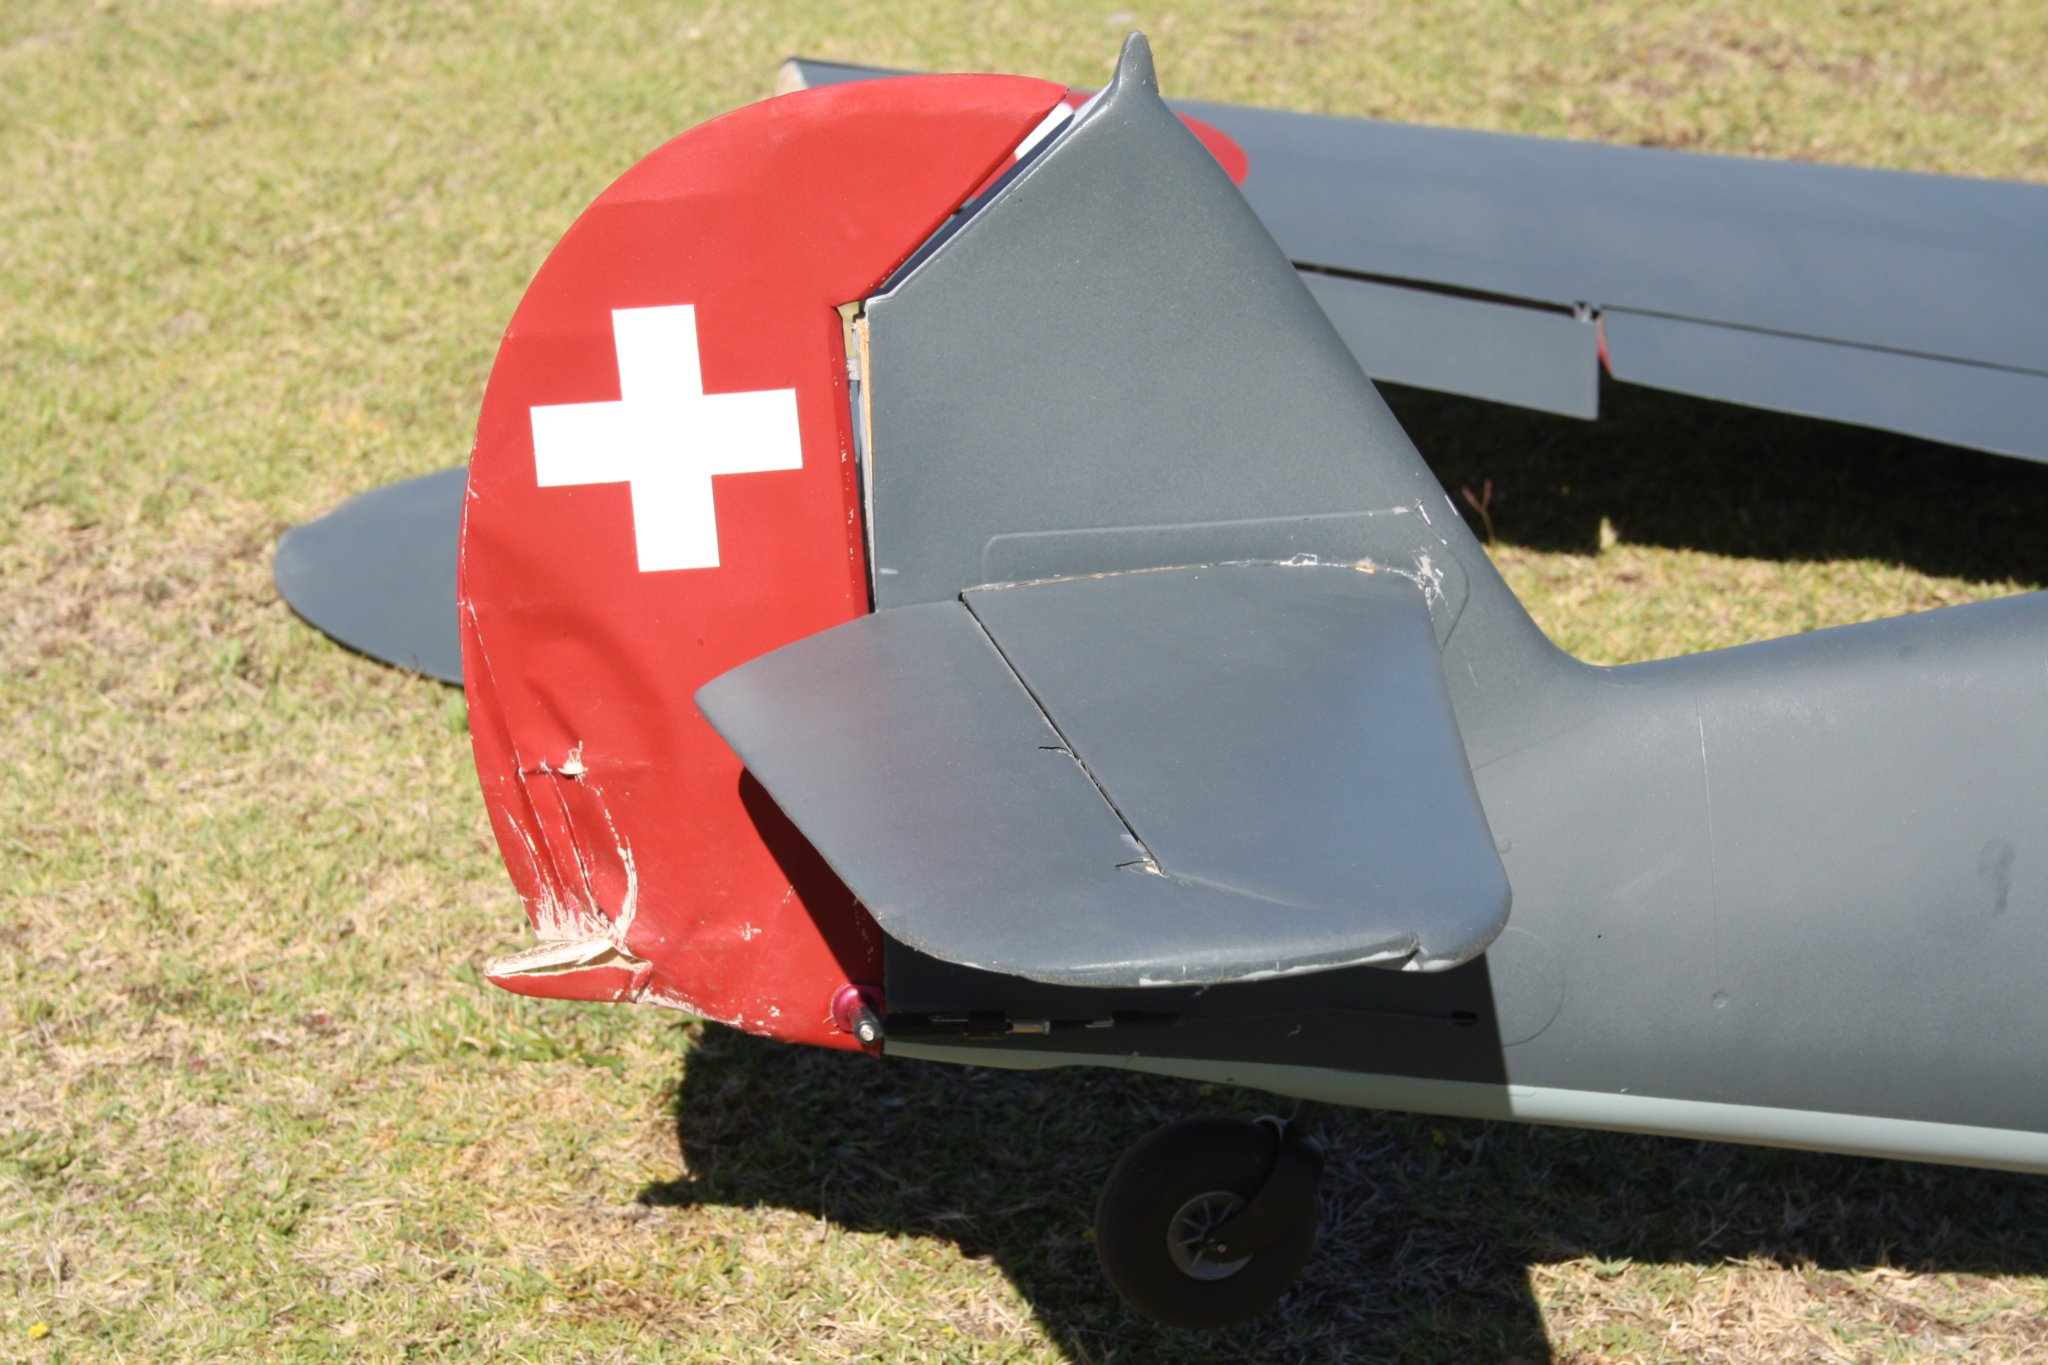 Click image for larger version  Name:2015_01_11 03 Test flight damage.JPG Views:292 Size:351.9 KB ID:2062882